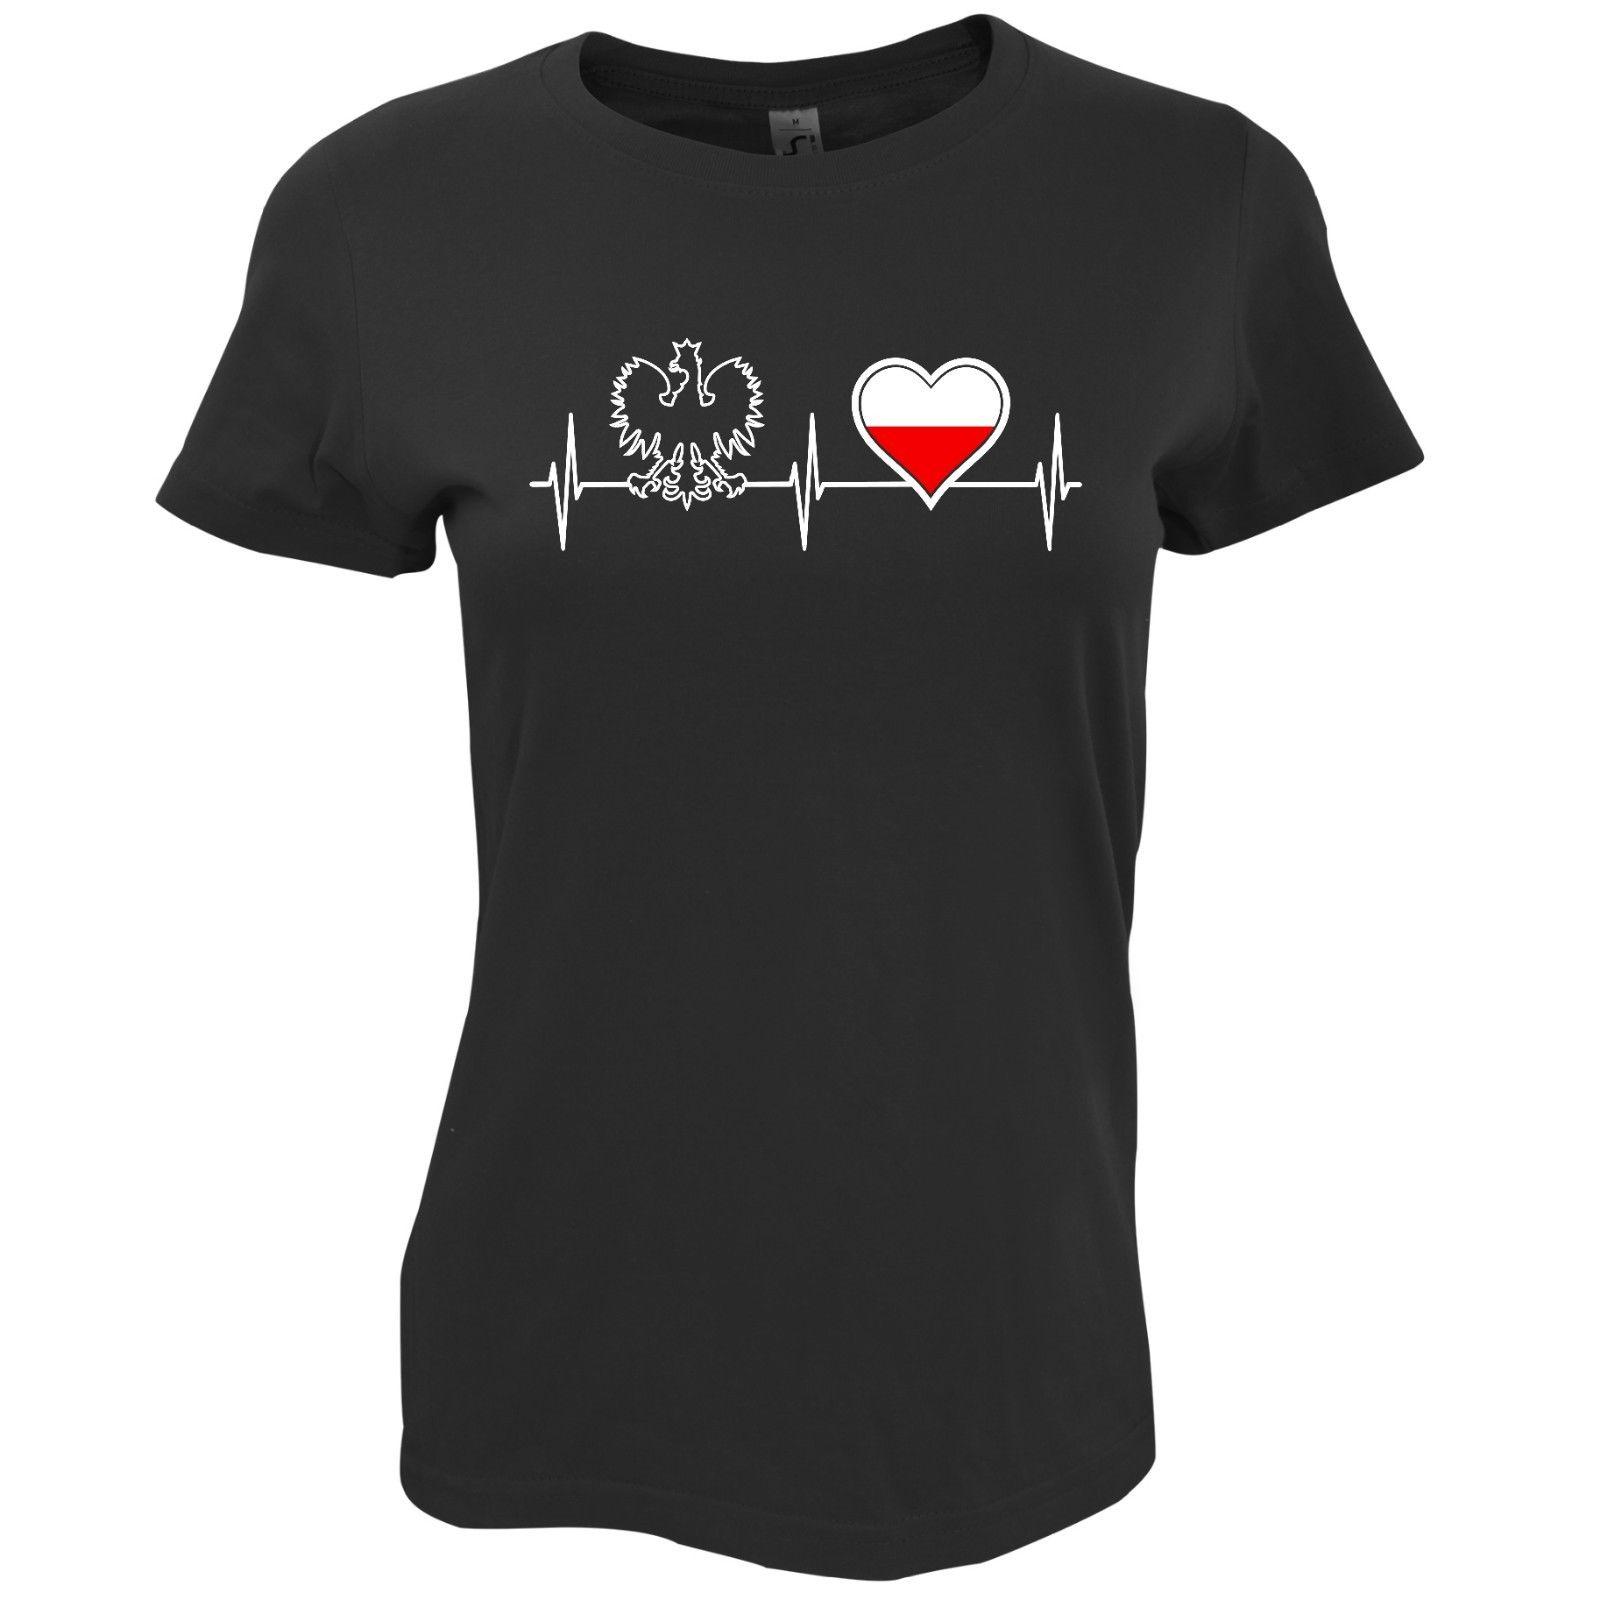 2018 Hot Sale Fashion Heart Poland POLSKA Women's Patriotic T-shirt Polish Tee Shirt